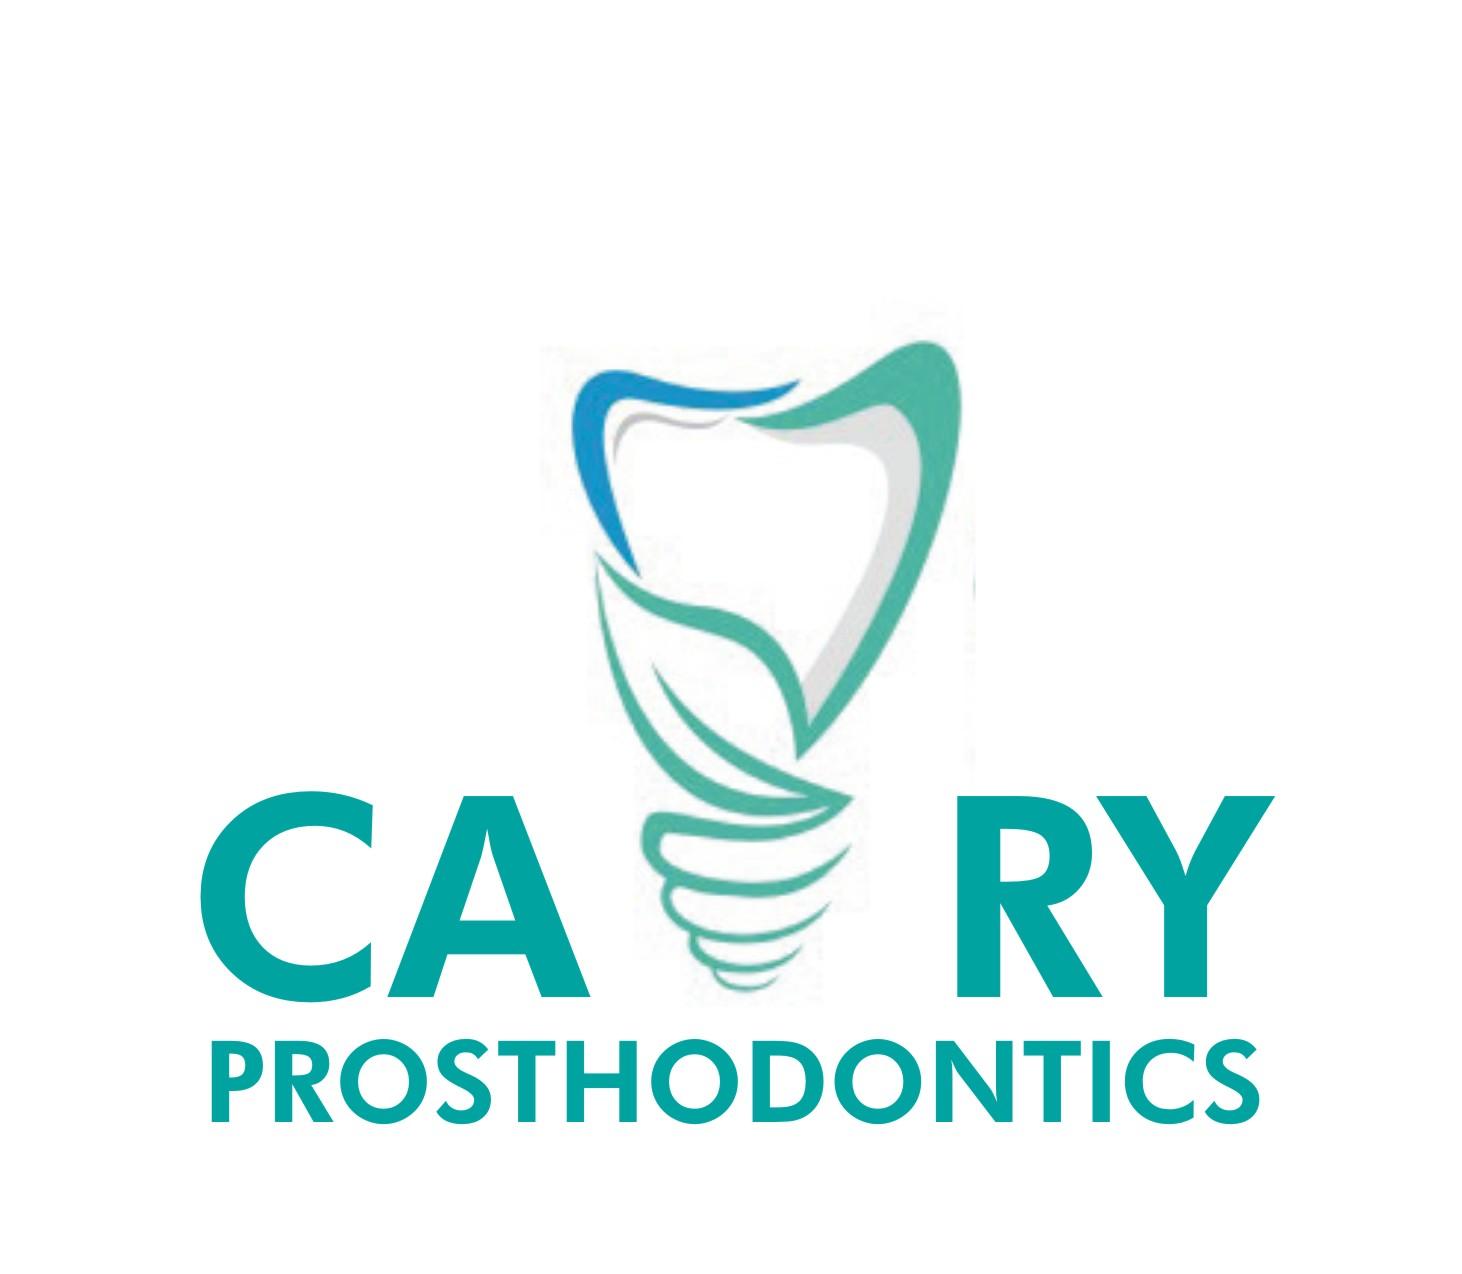 Logo Design by I graphics GRAPHICS - Entry No. 89 in the Logo Design Contest Cary Prosthodontics Logo Design.